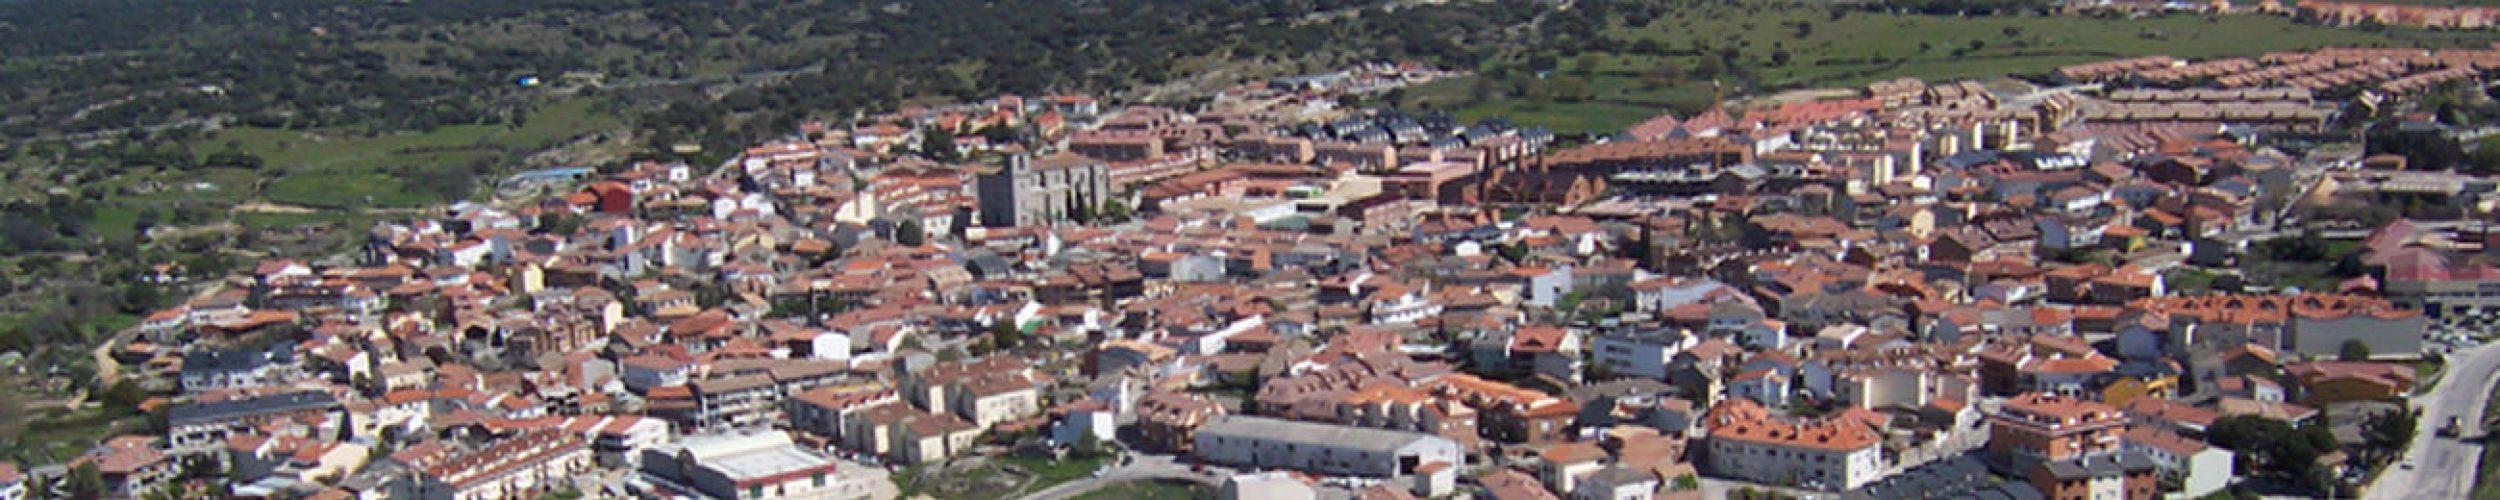 panoramica valdemorillo